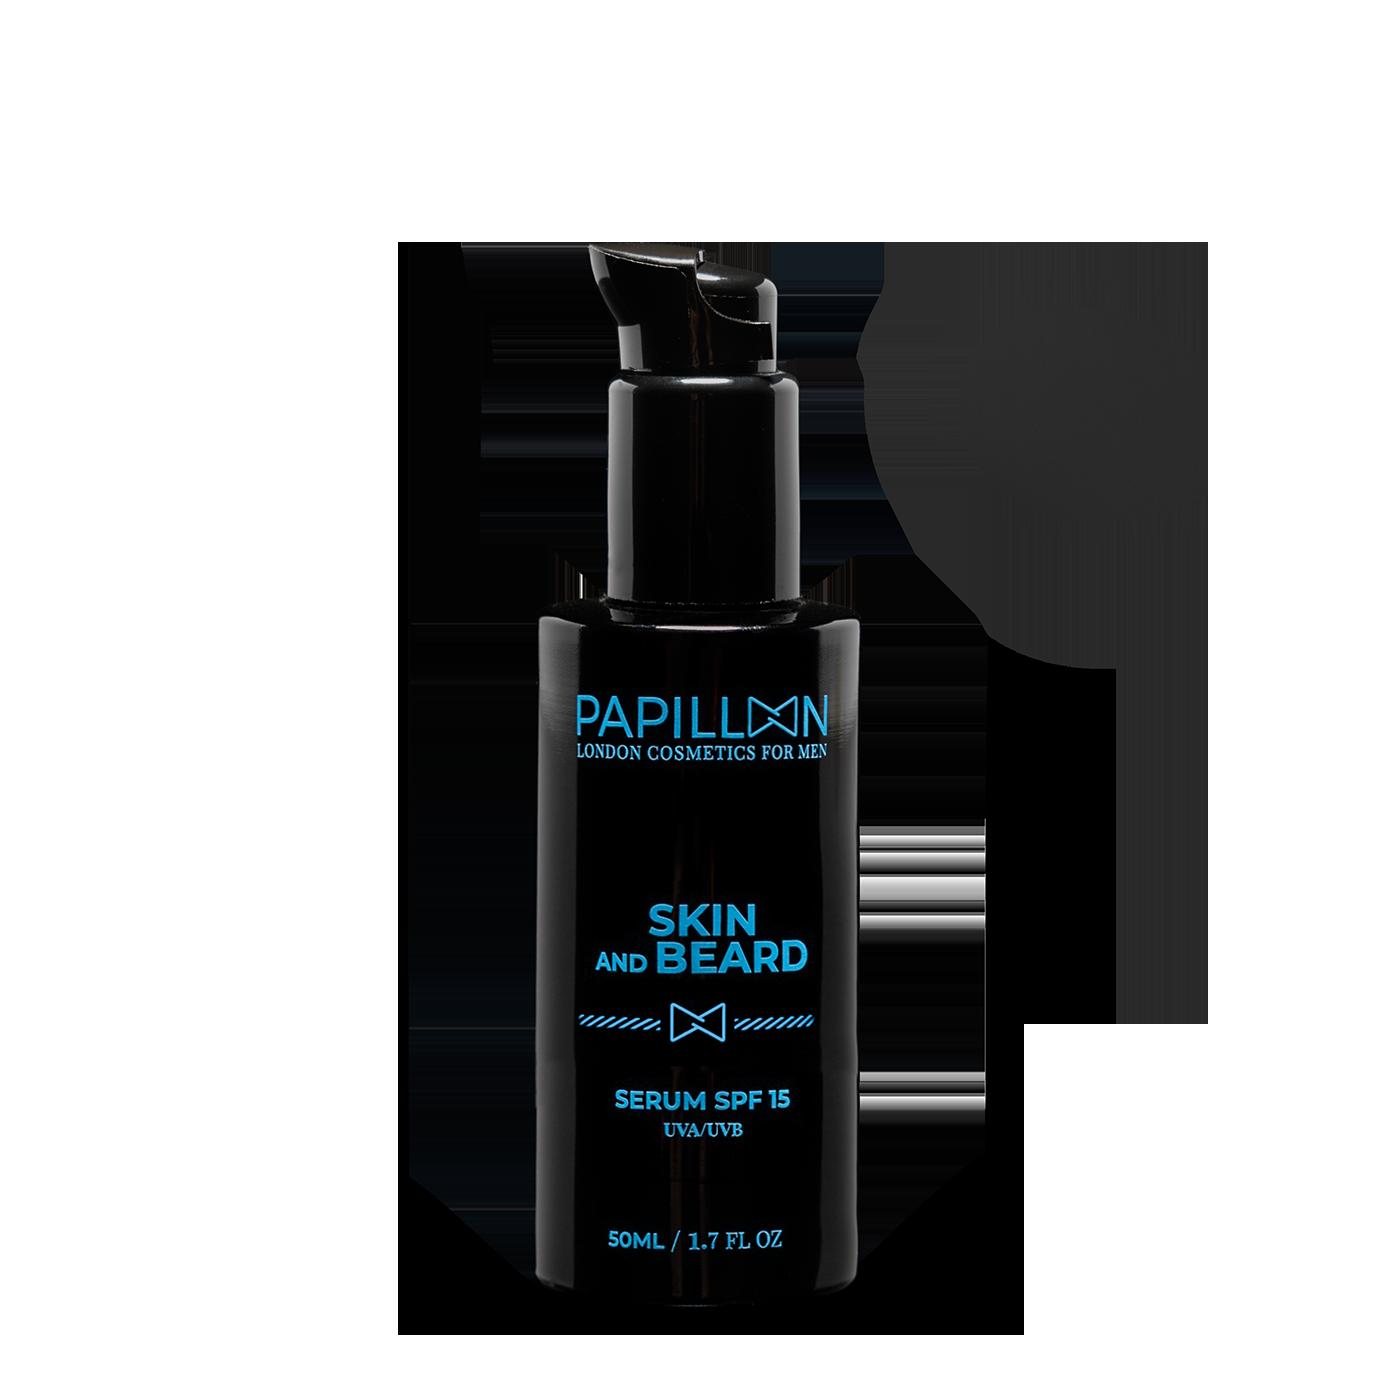 PAPILLON SERUM SKIN AND BEARD SPF 15